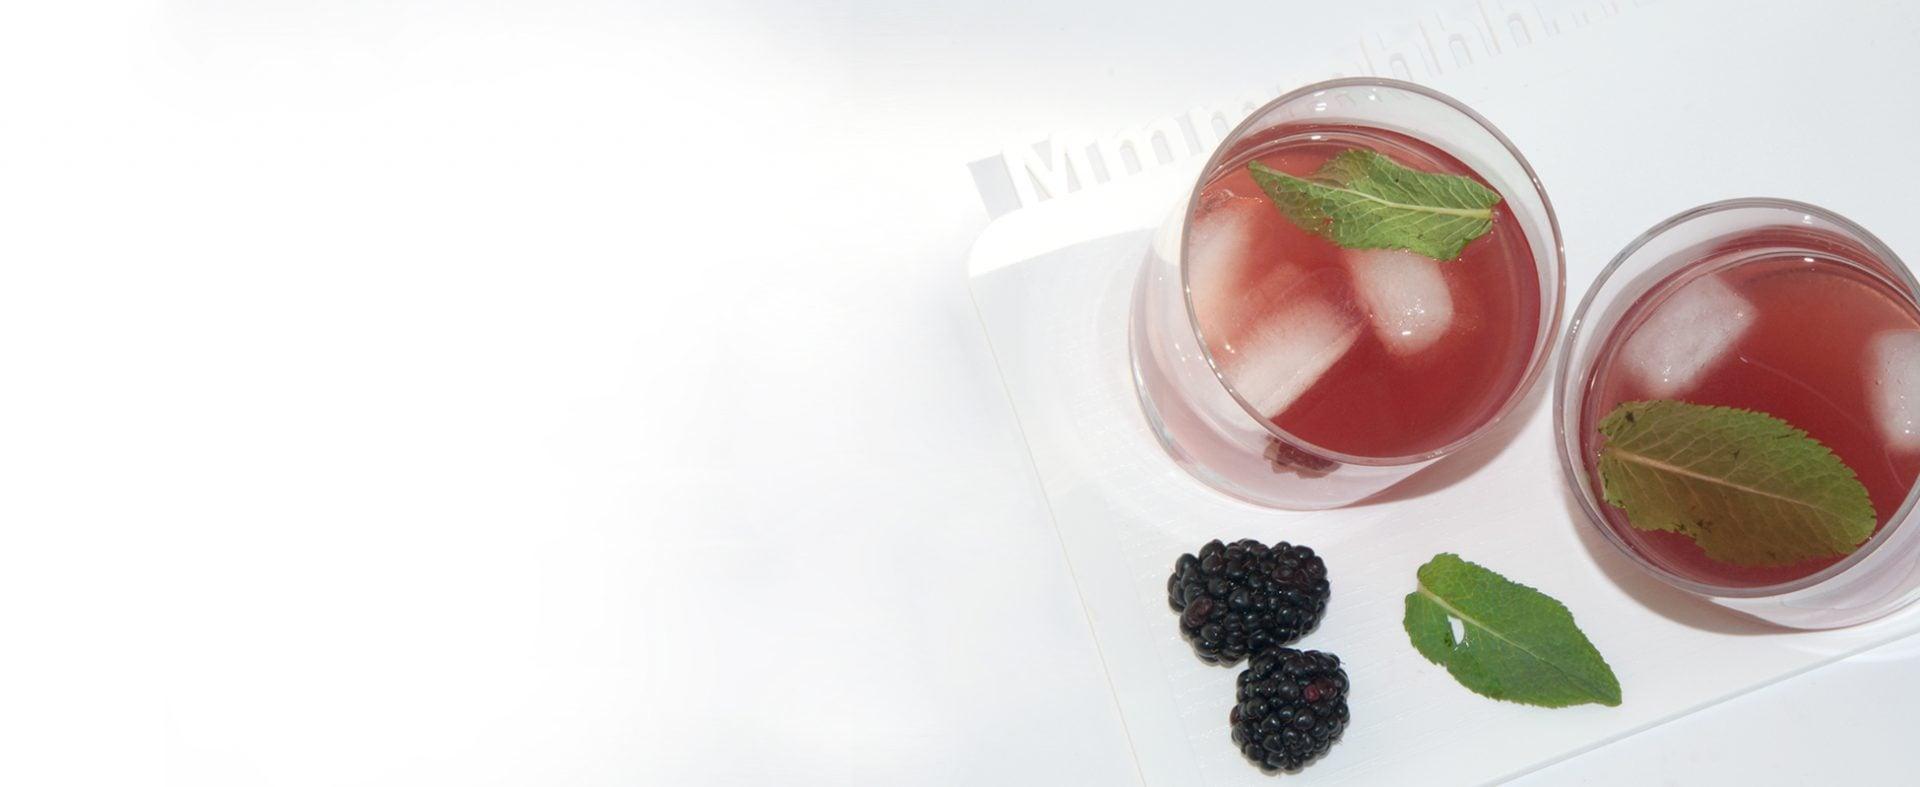 #3. Fresh & Fruity: Blackberry-Mint Iced Tea - Bittersweet Beverages